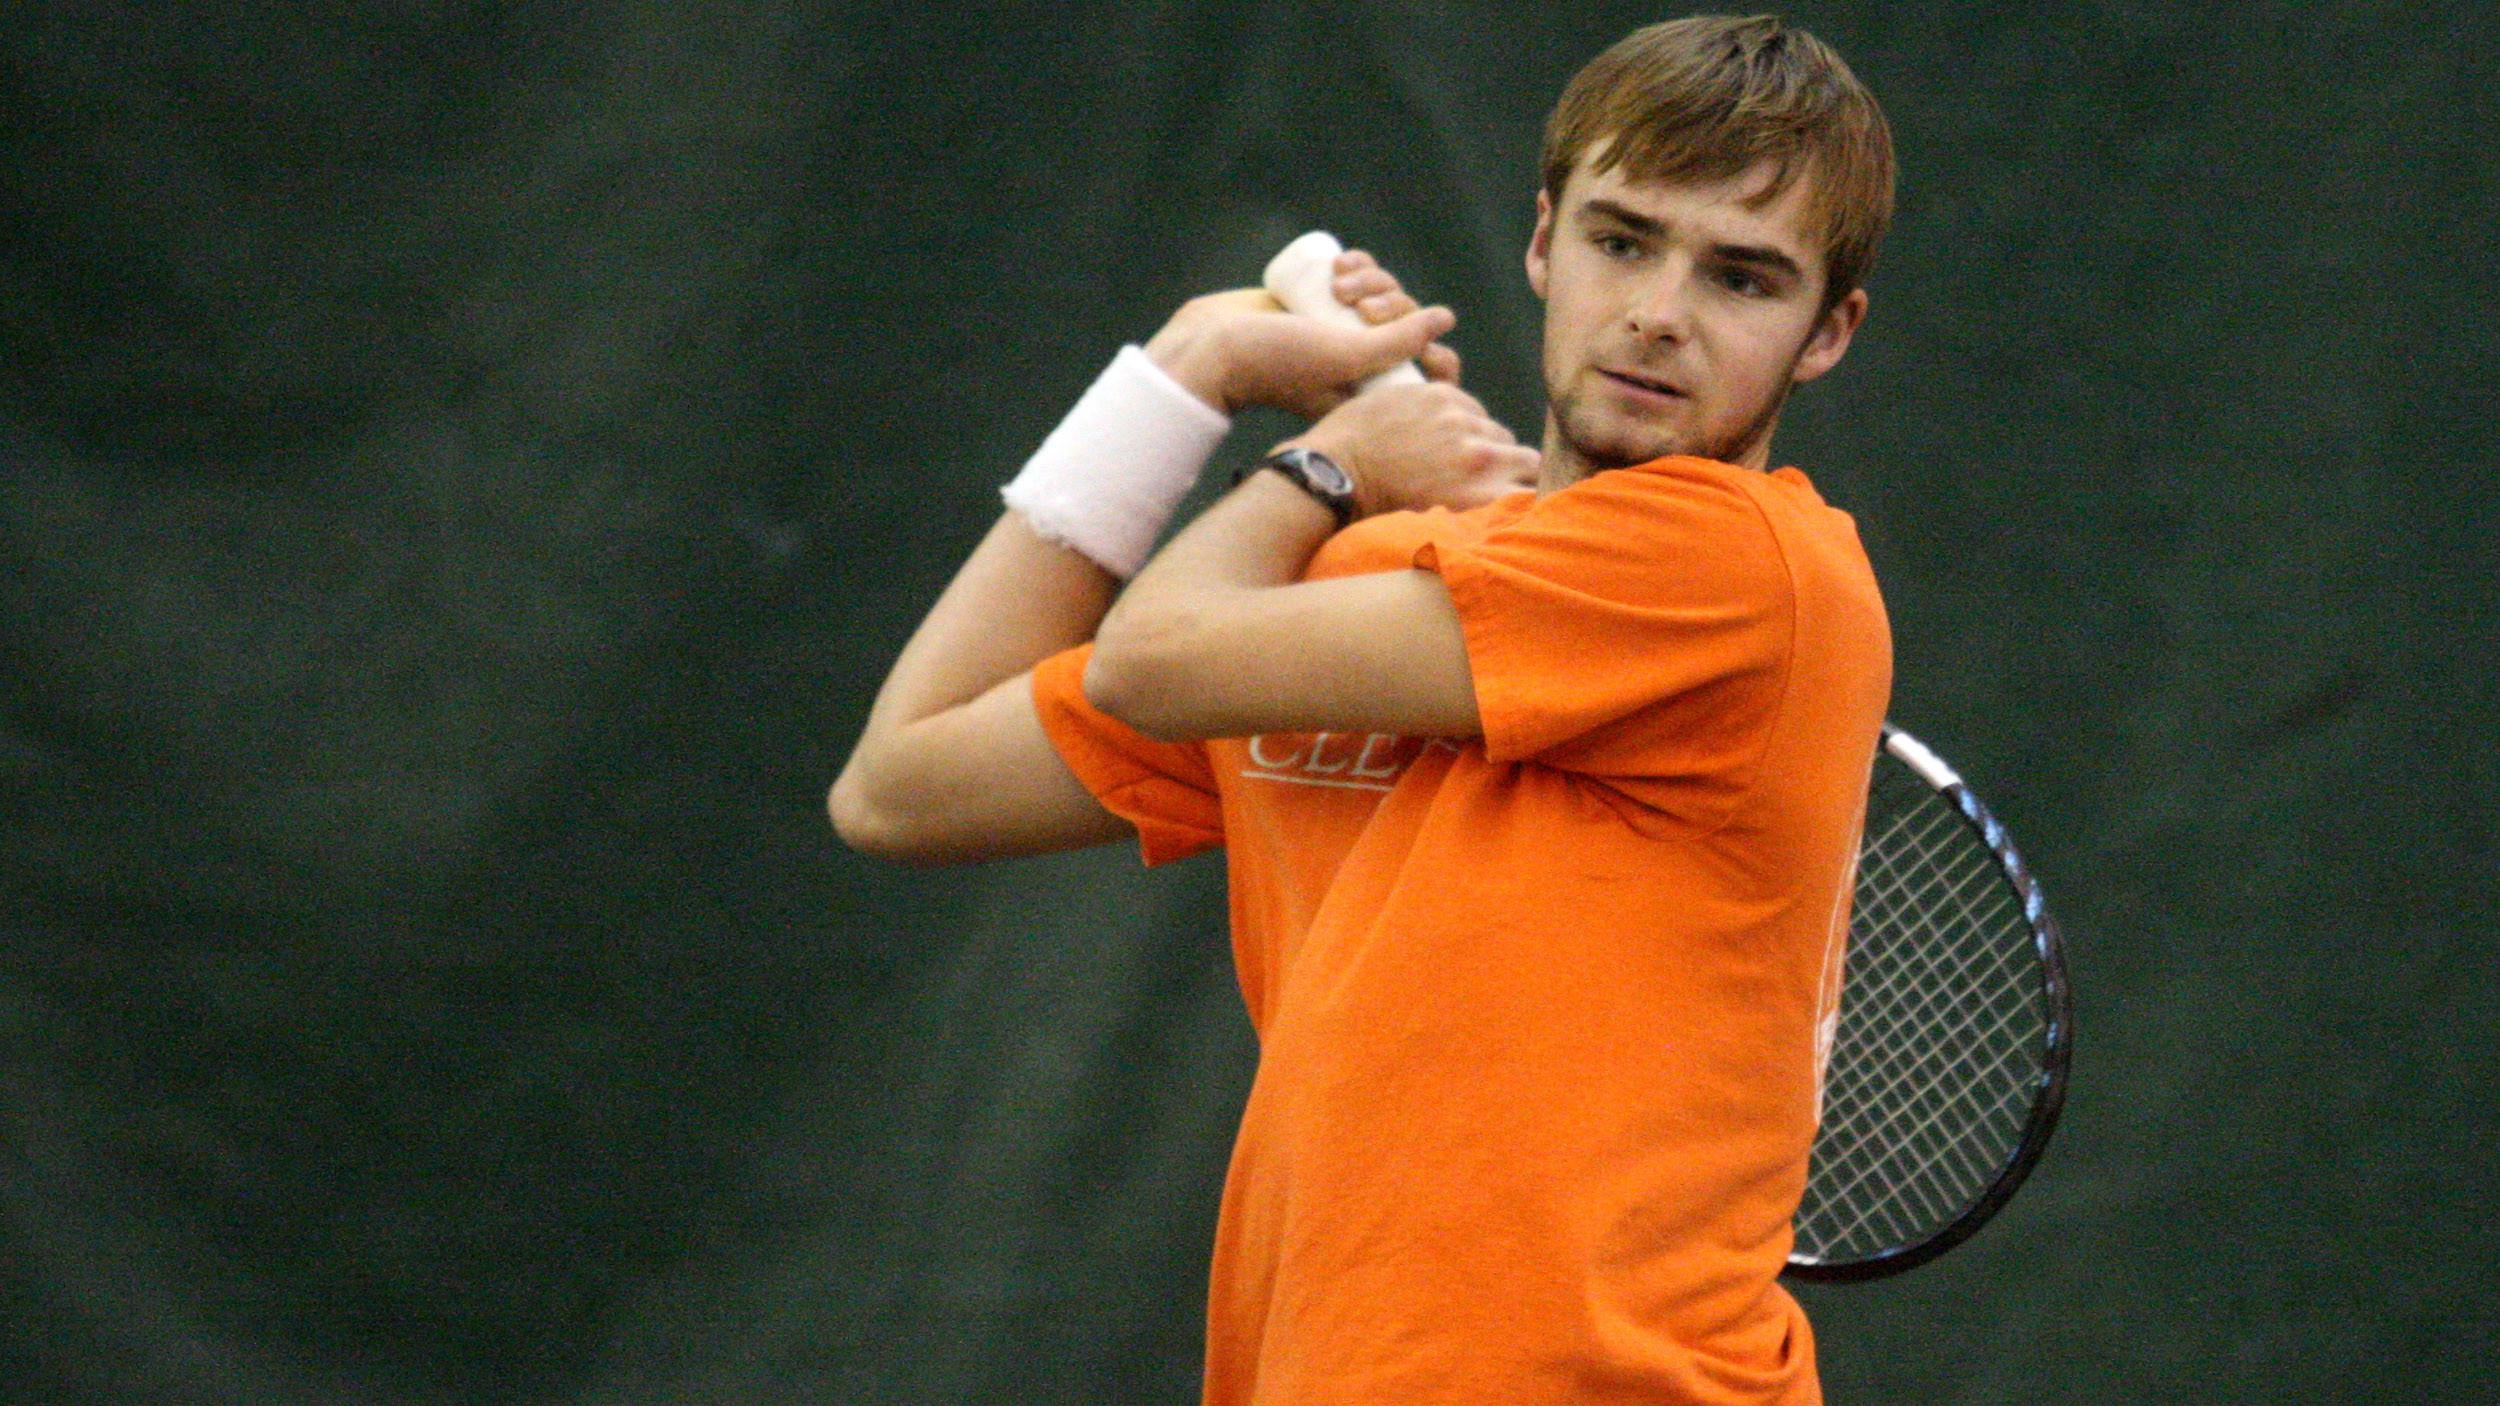 Two Clemson Players Advance to Singles Third Round at Carolinas Regional